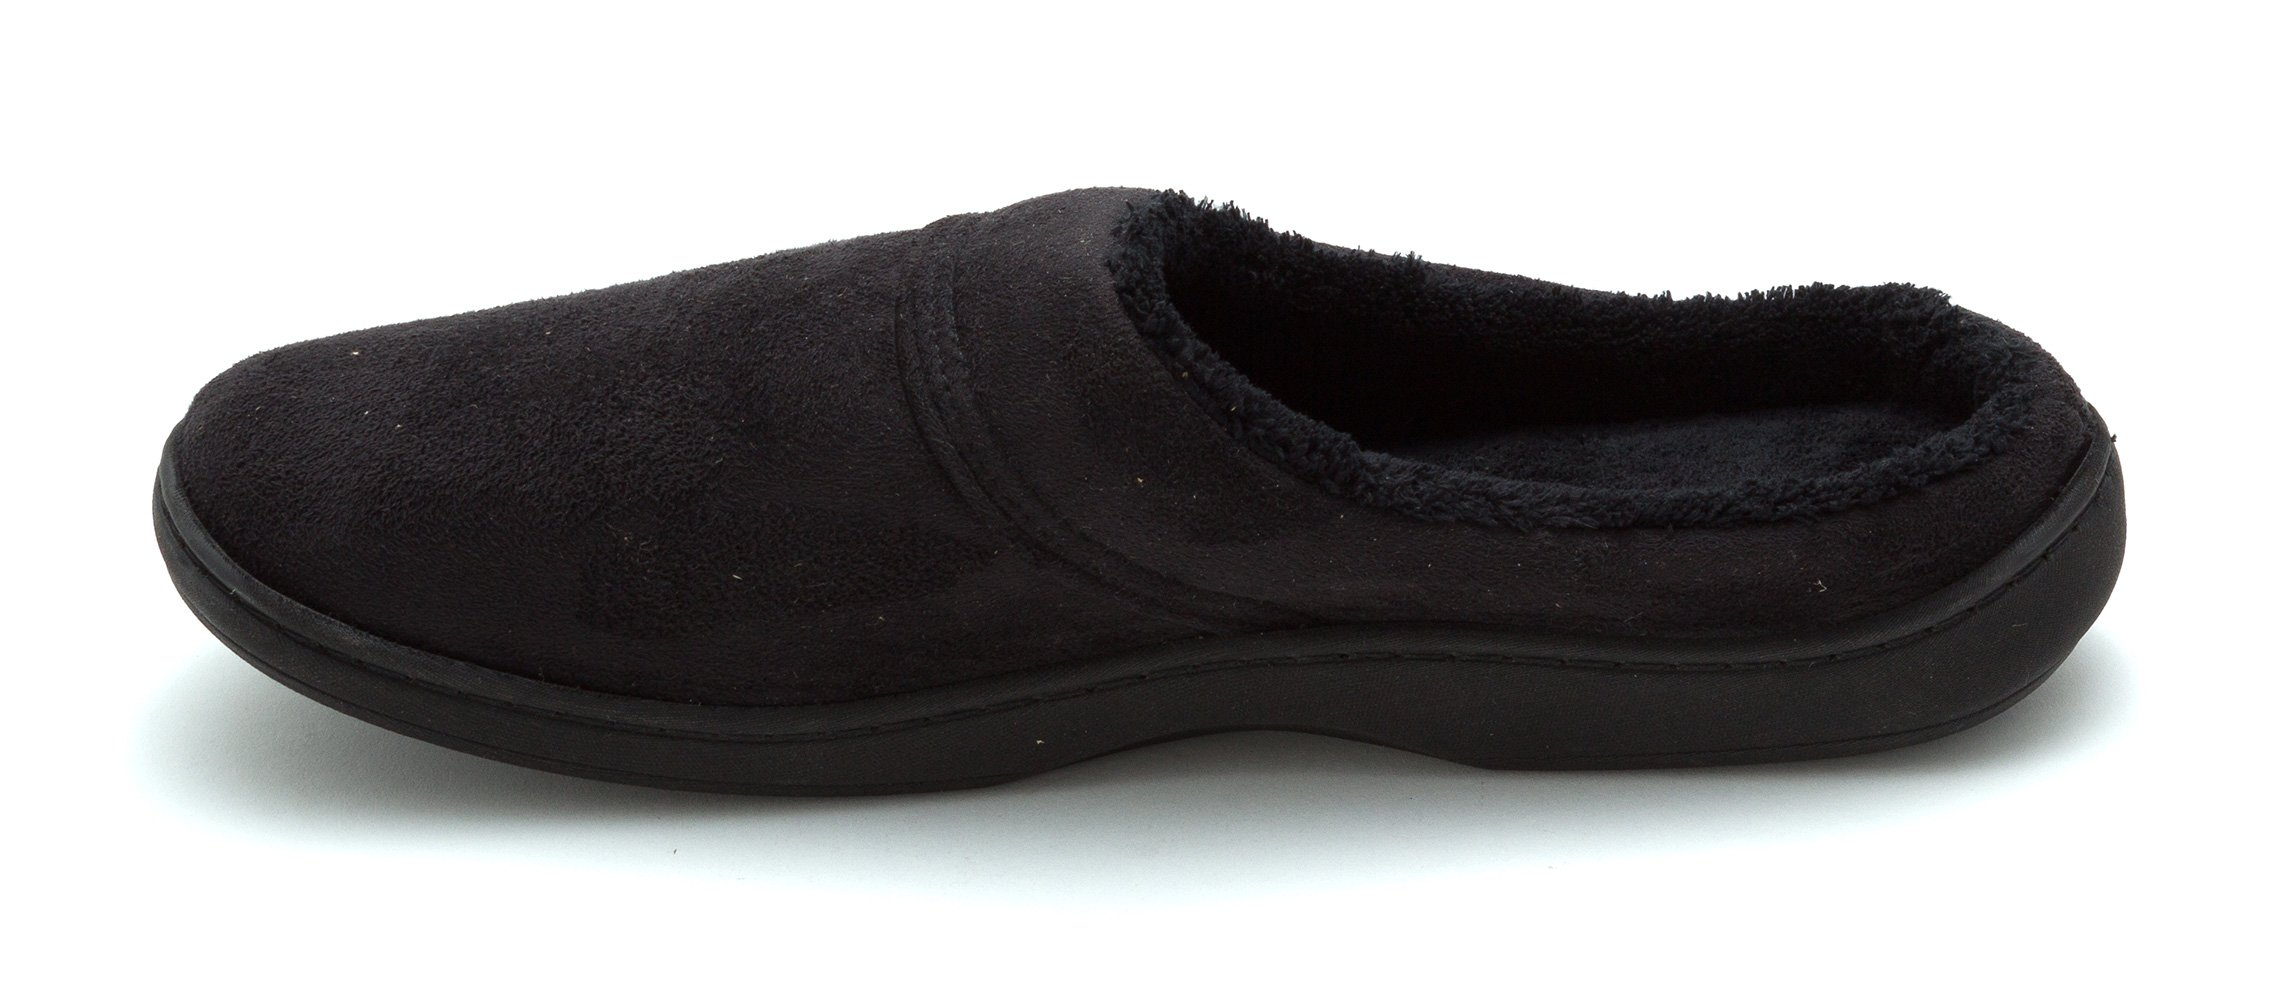 df3cfb436ca22 Get Quotations · ISOTONER Mens Men's Slip-on Mule Closed Toe Slip On  Slippers